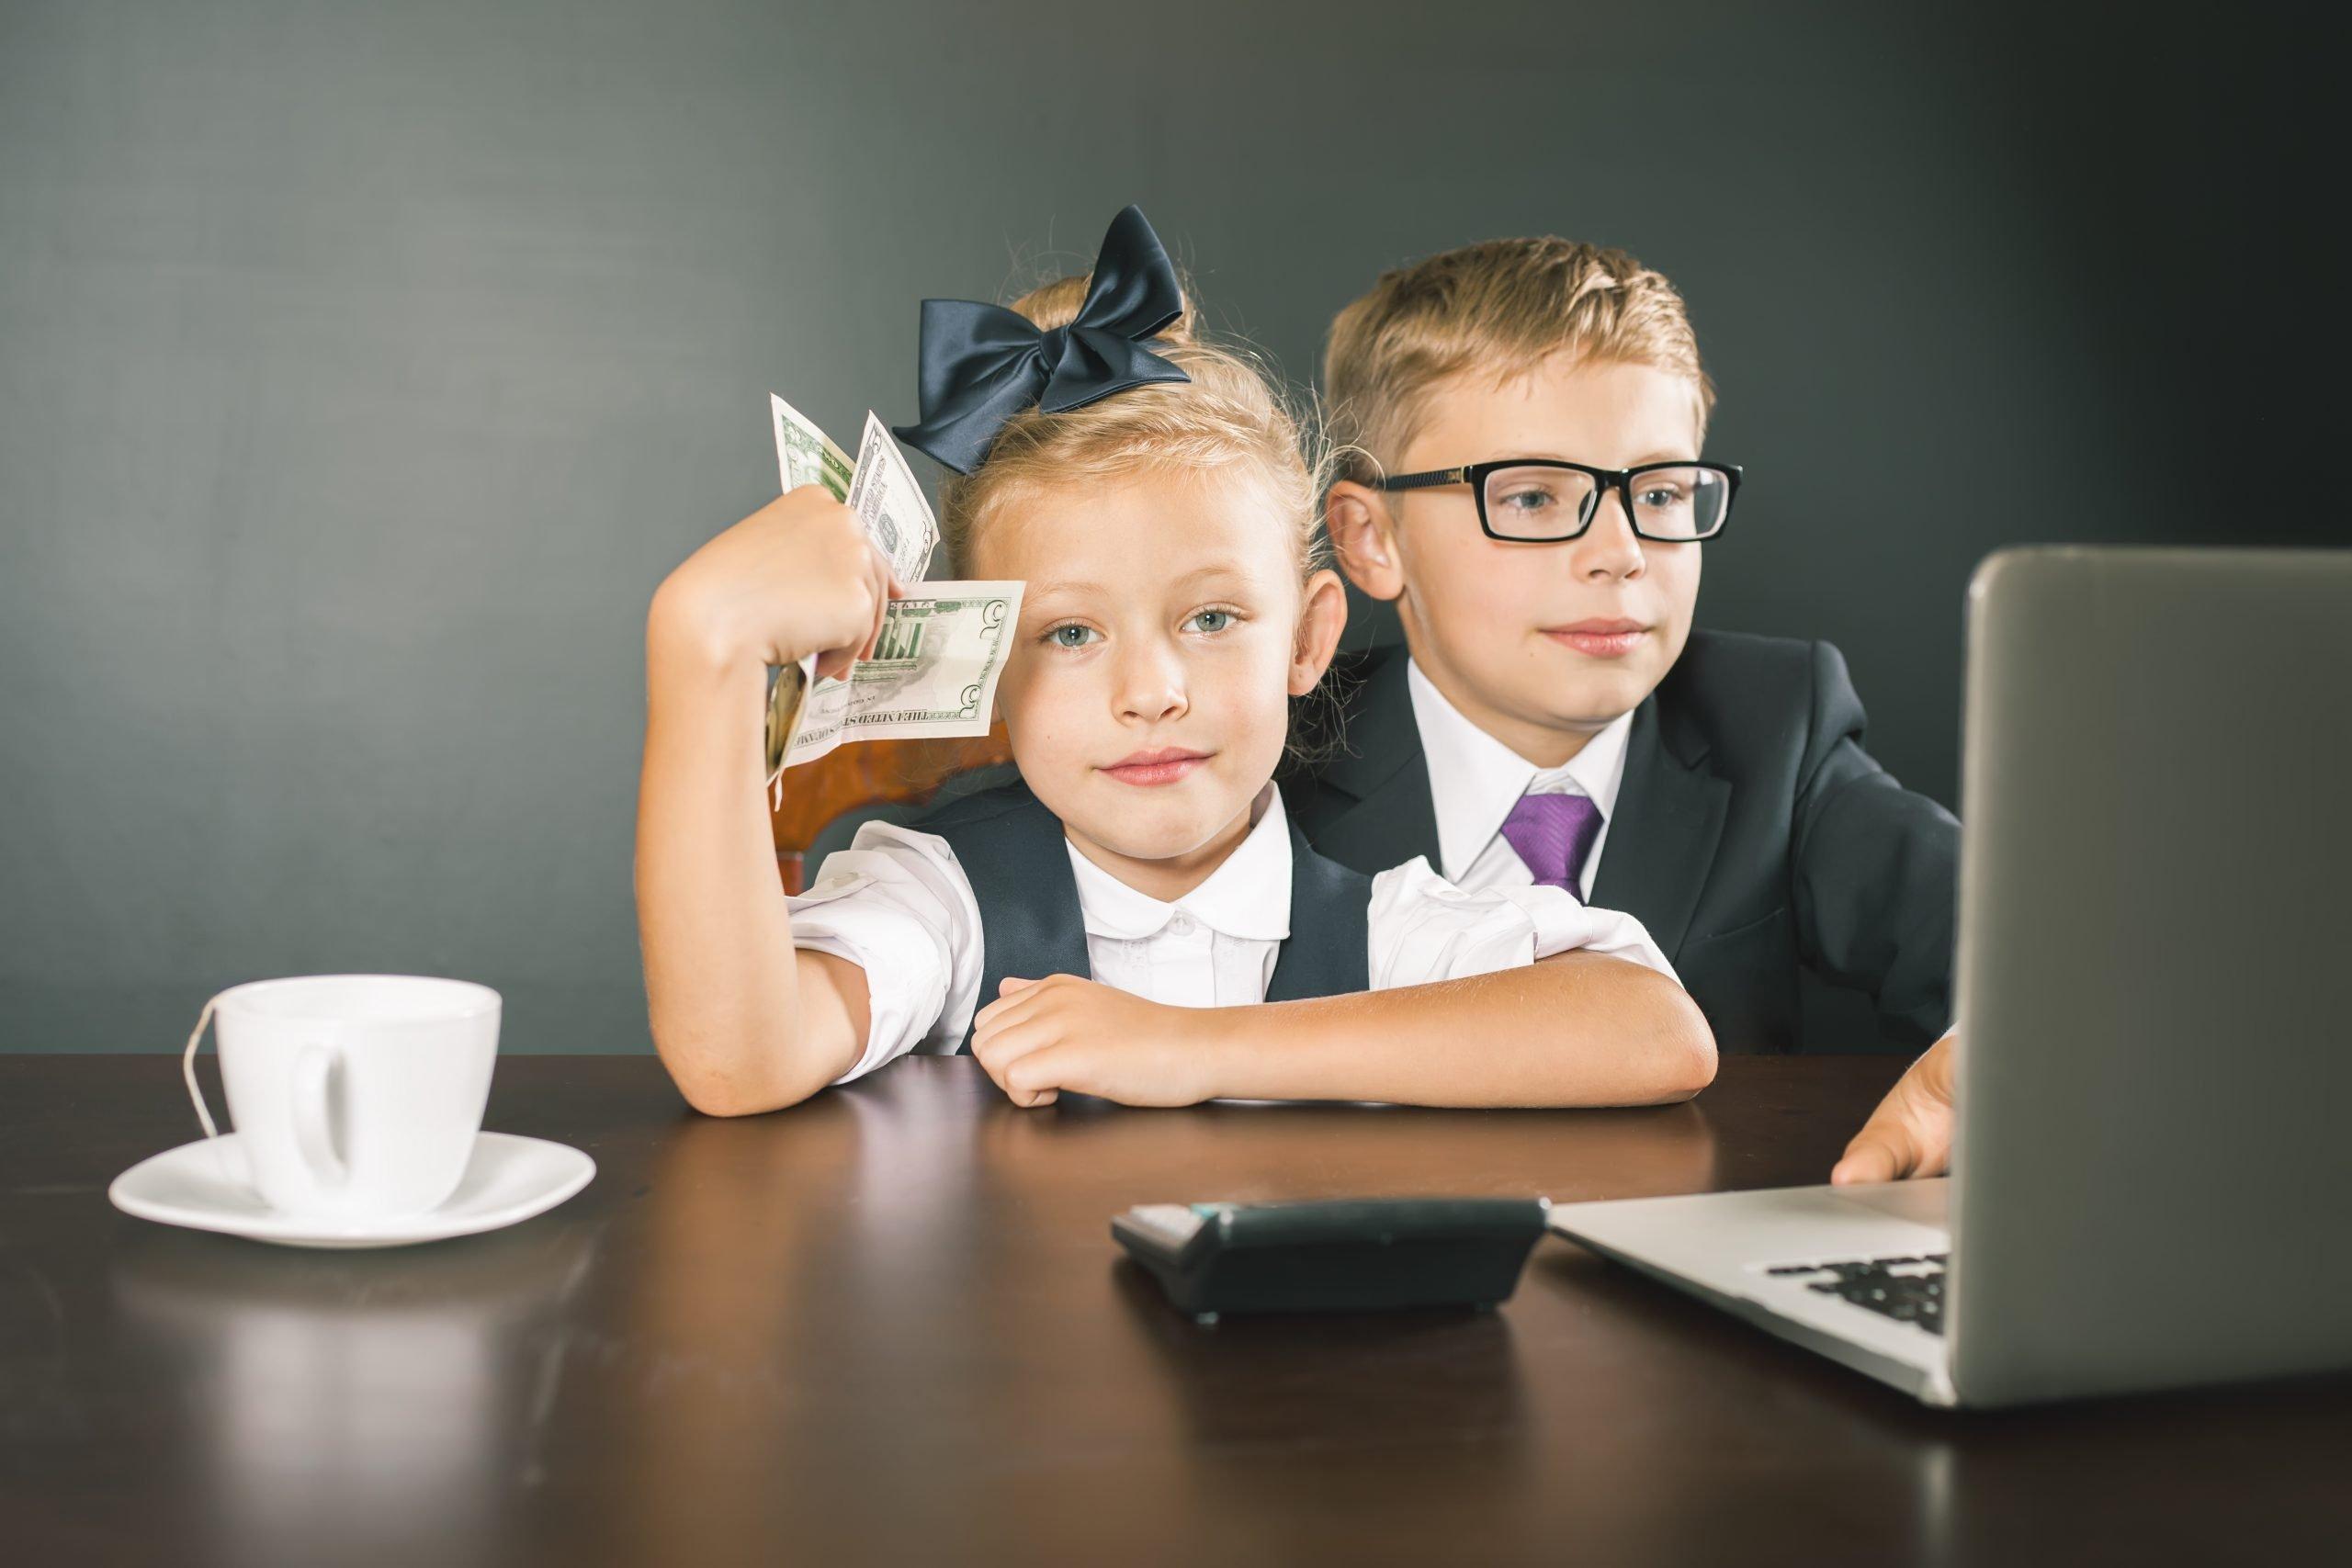 ethereum smart money indicator obv